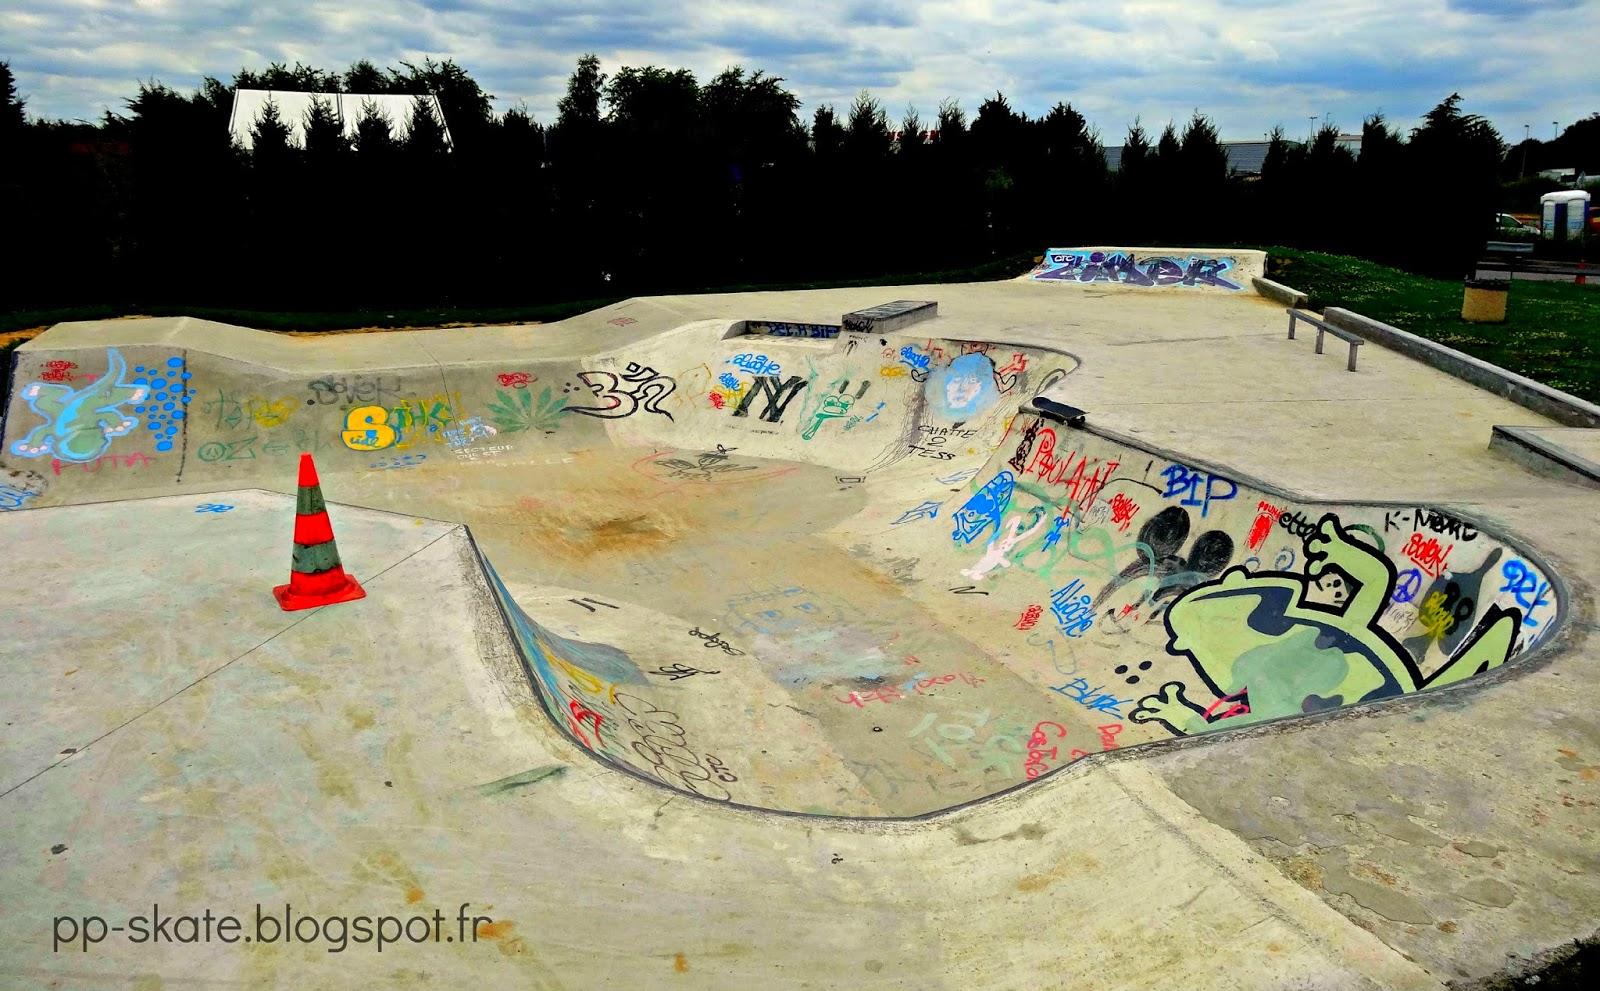 Bowl skatepark Le plessis Pate